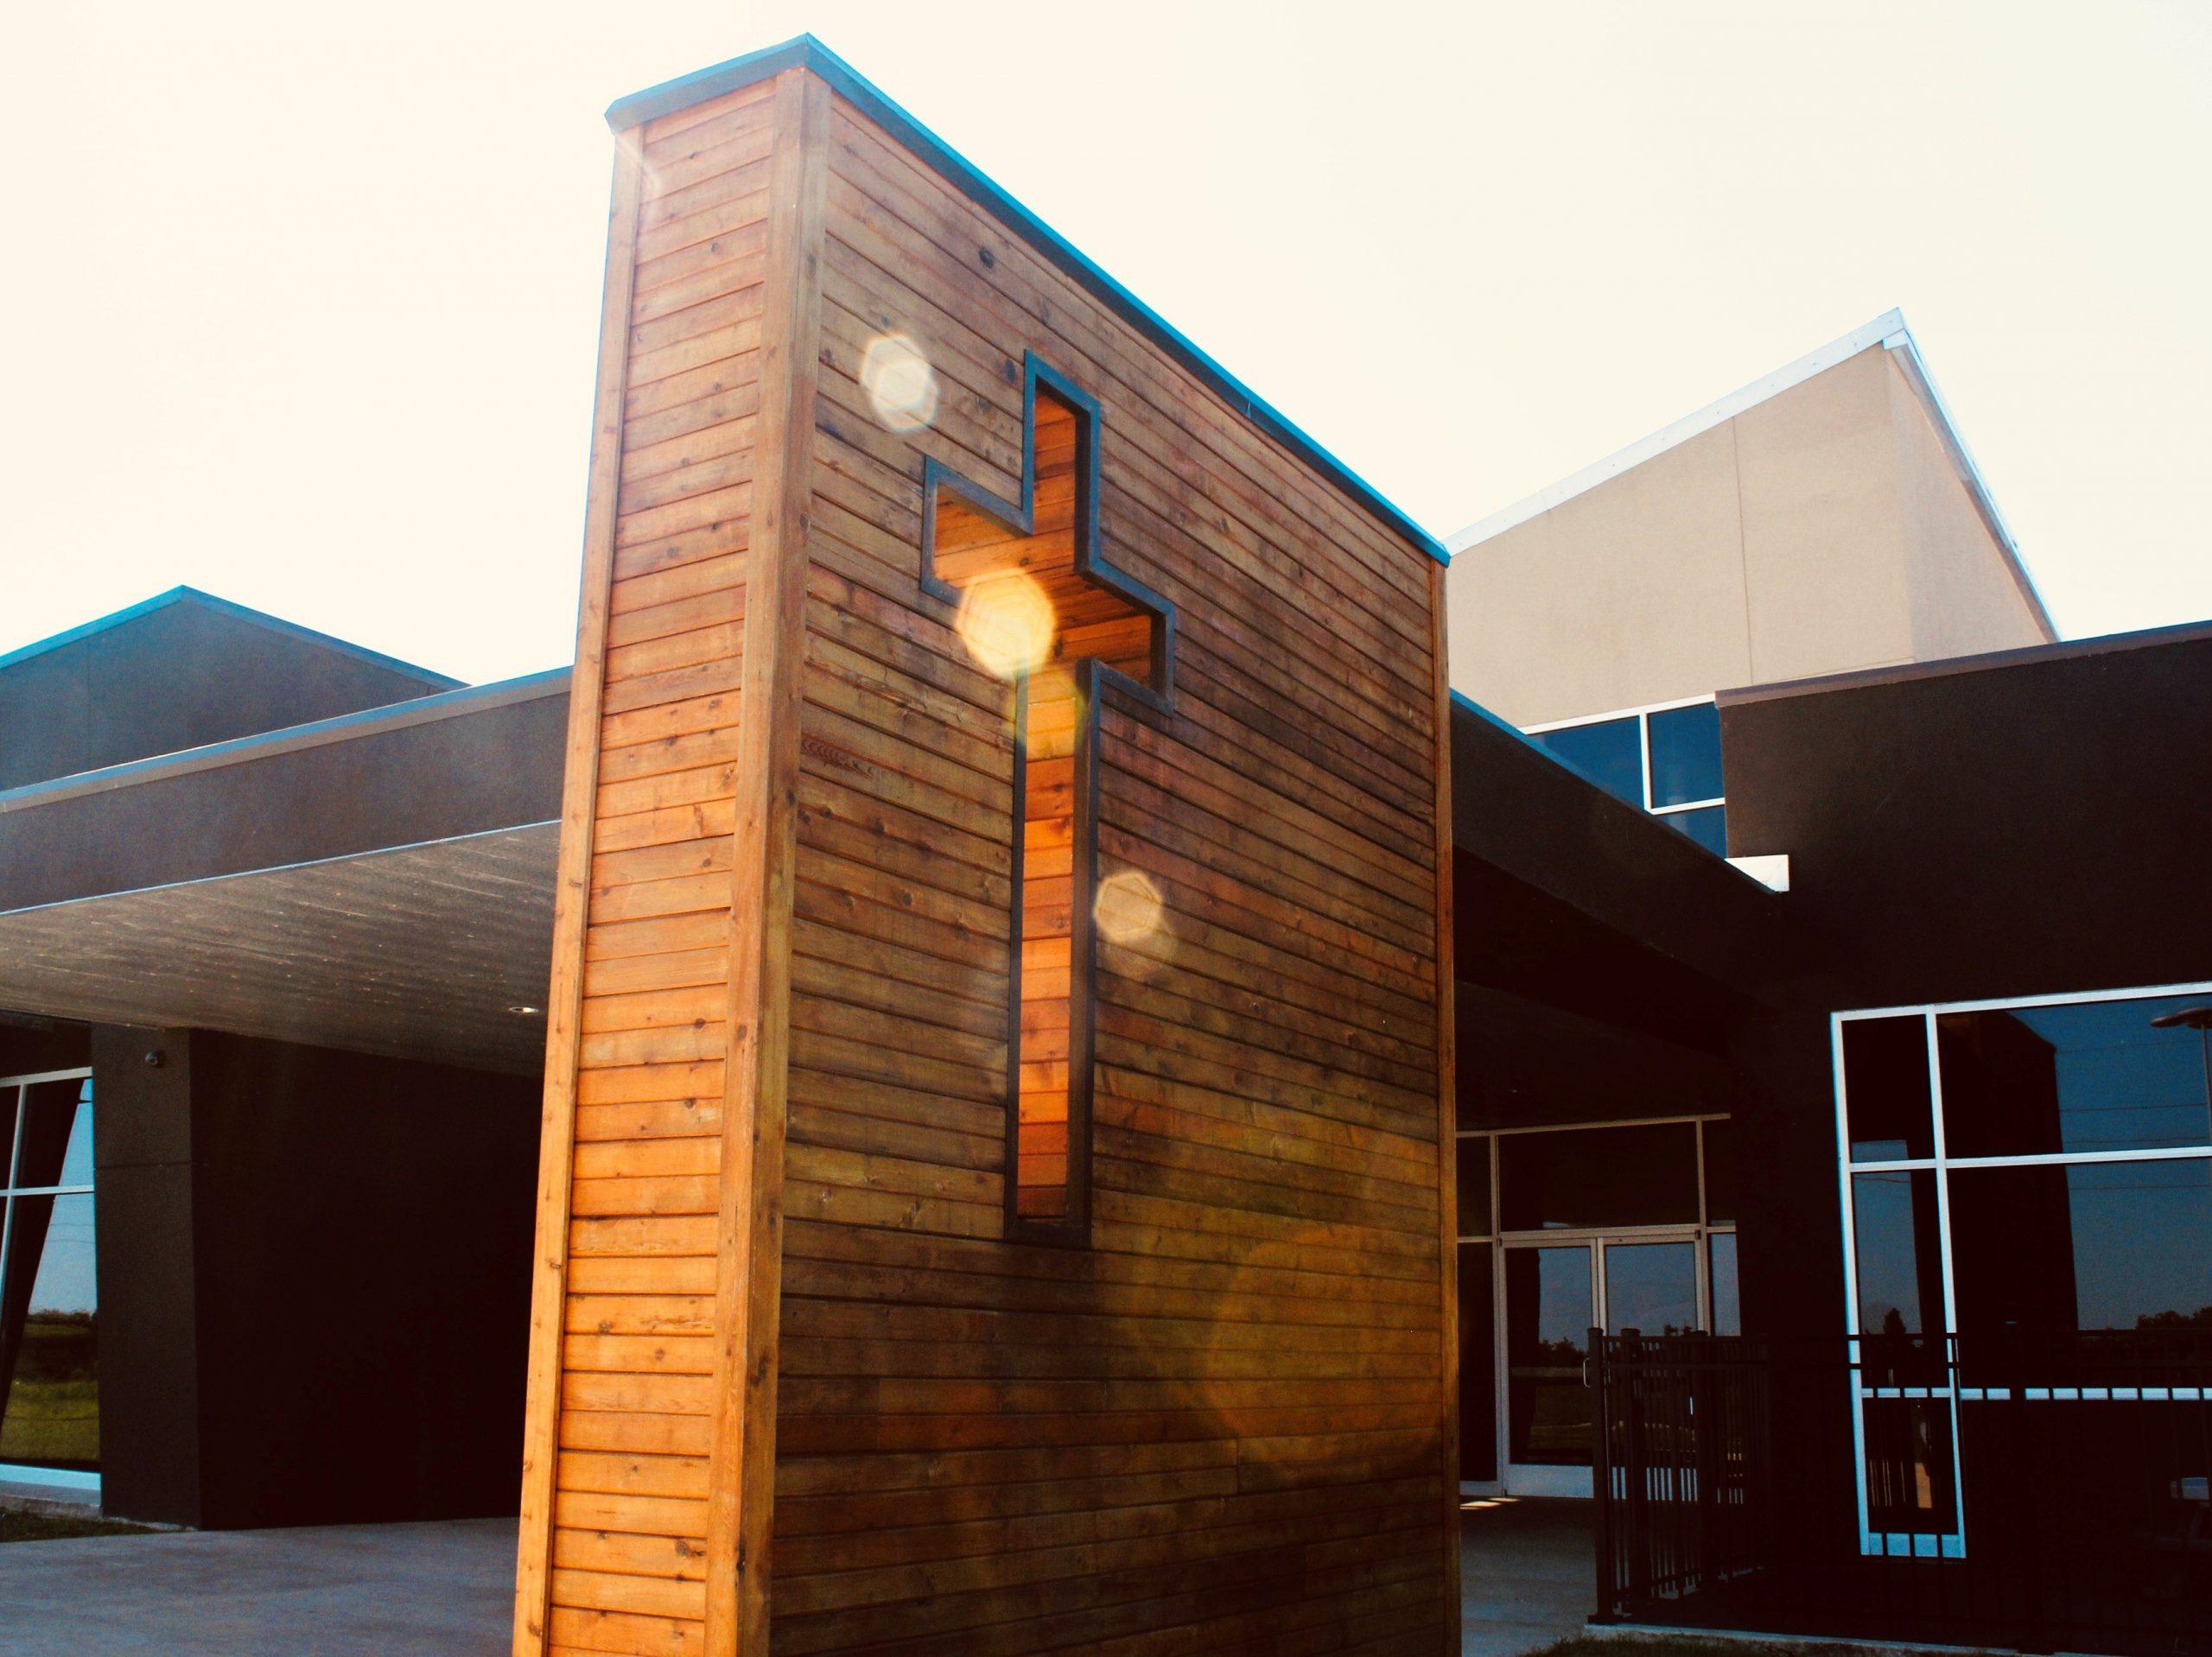 Meadows Church of Christ